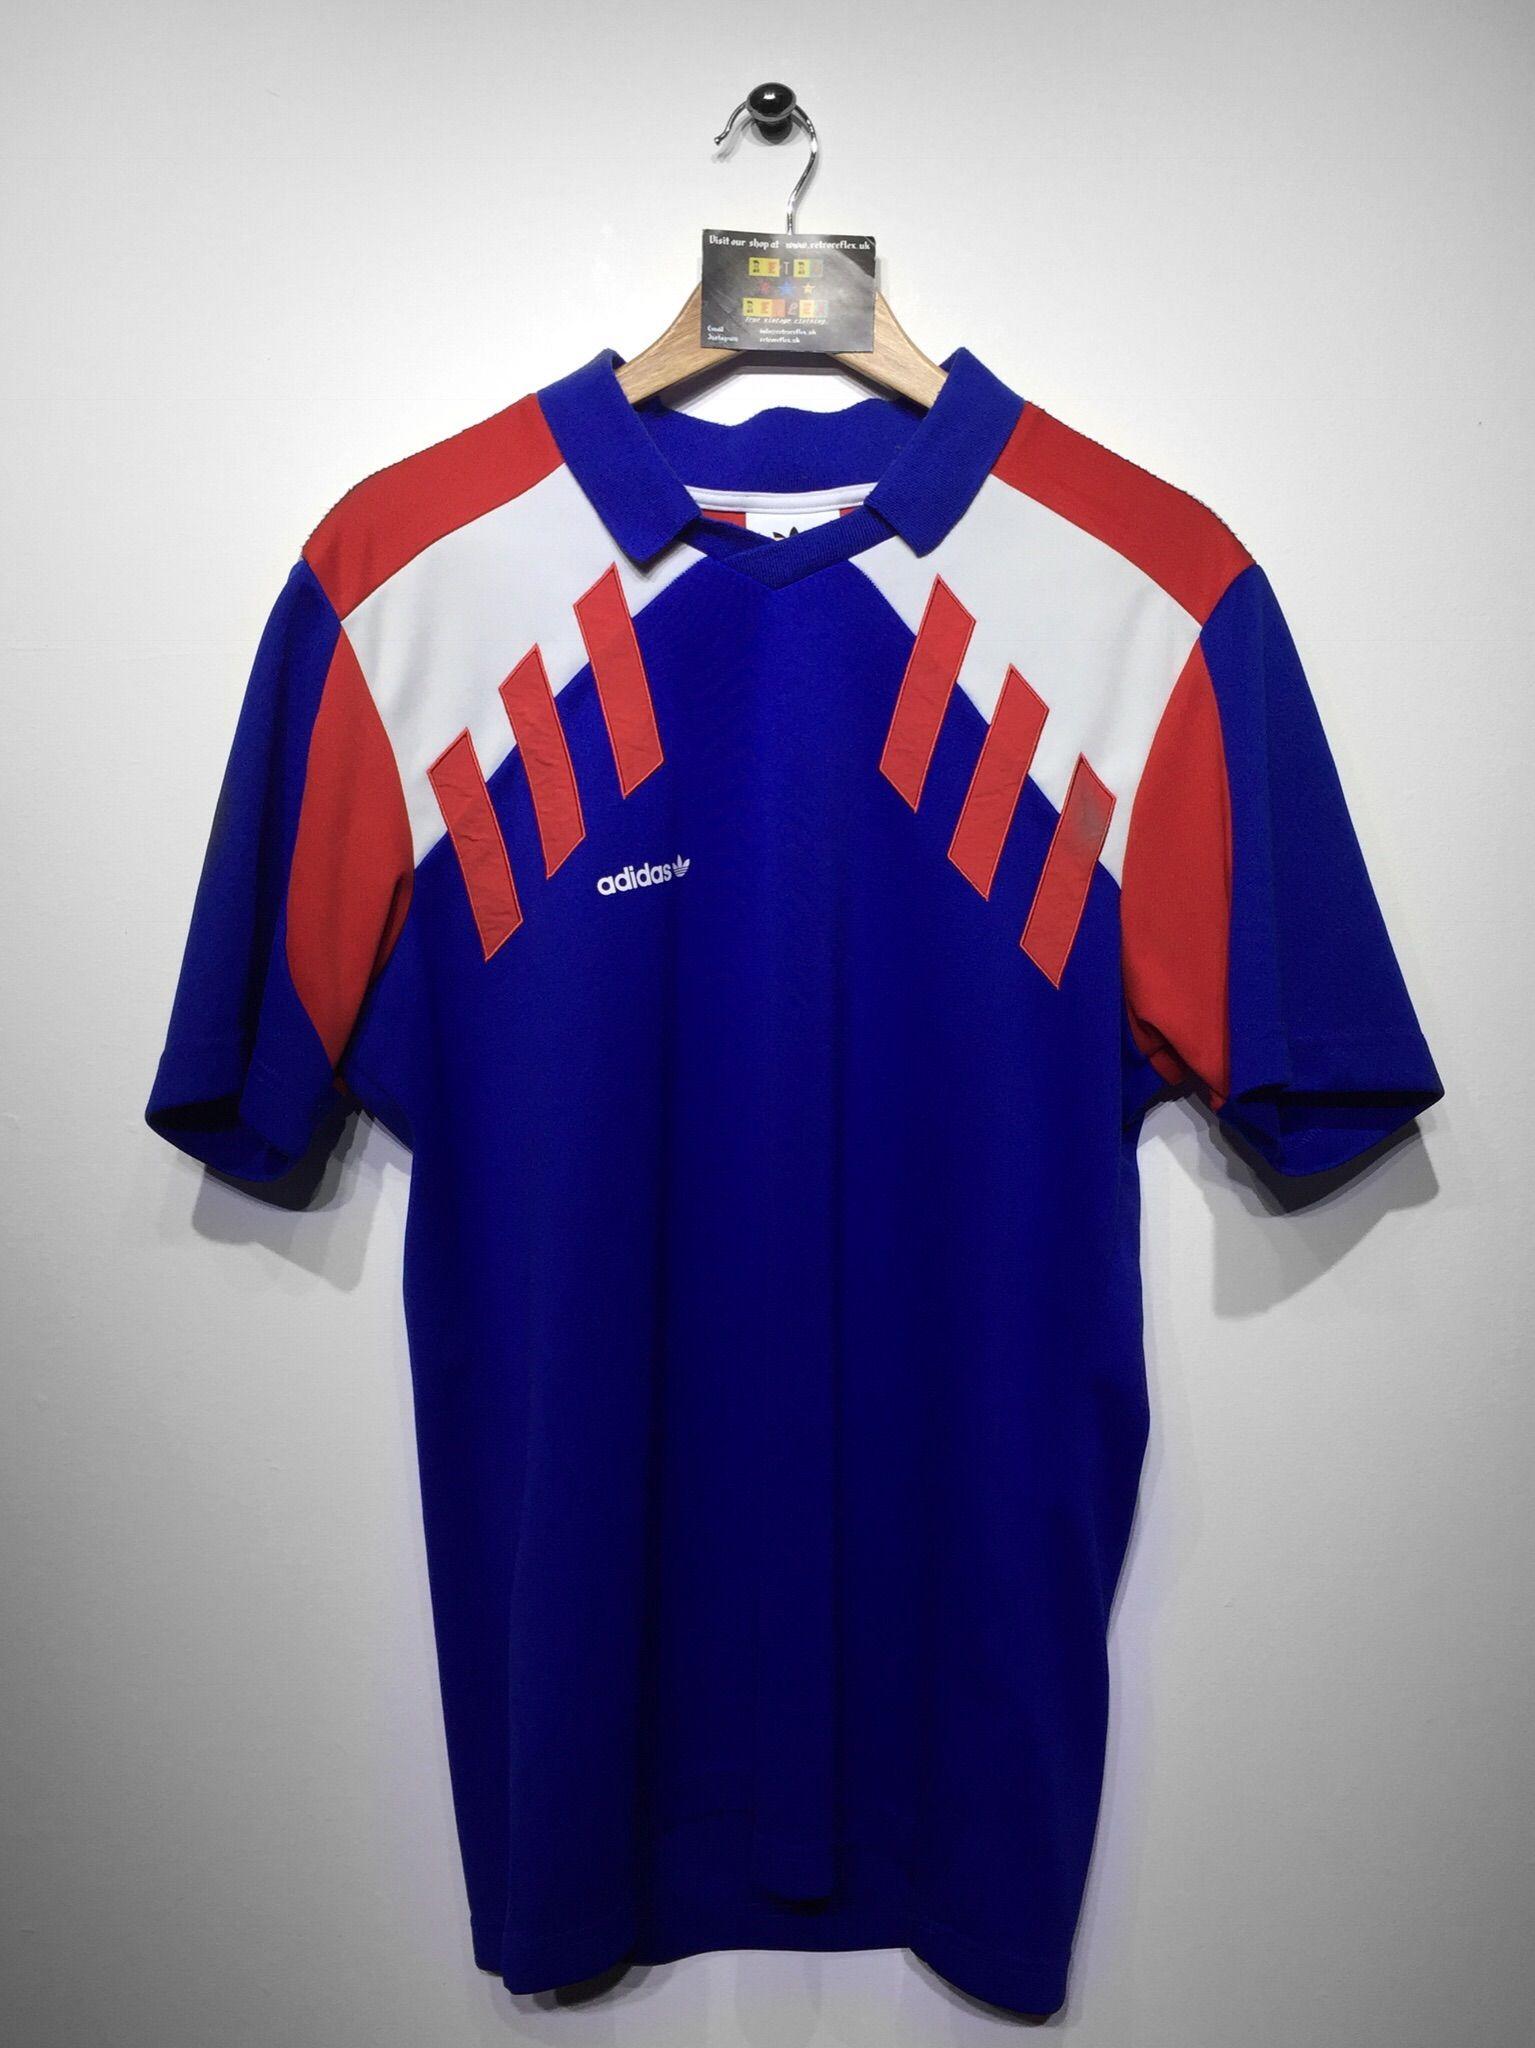 729985ba01f6 Adidas Polo Shirt Size Large £22 Website➡ www.retroreflex.uk ...